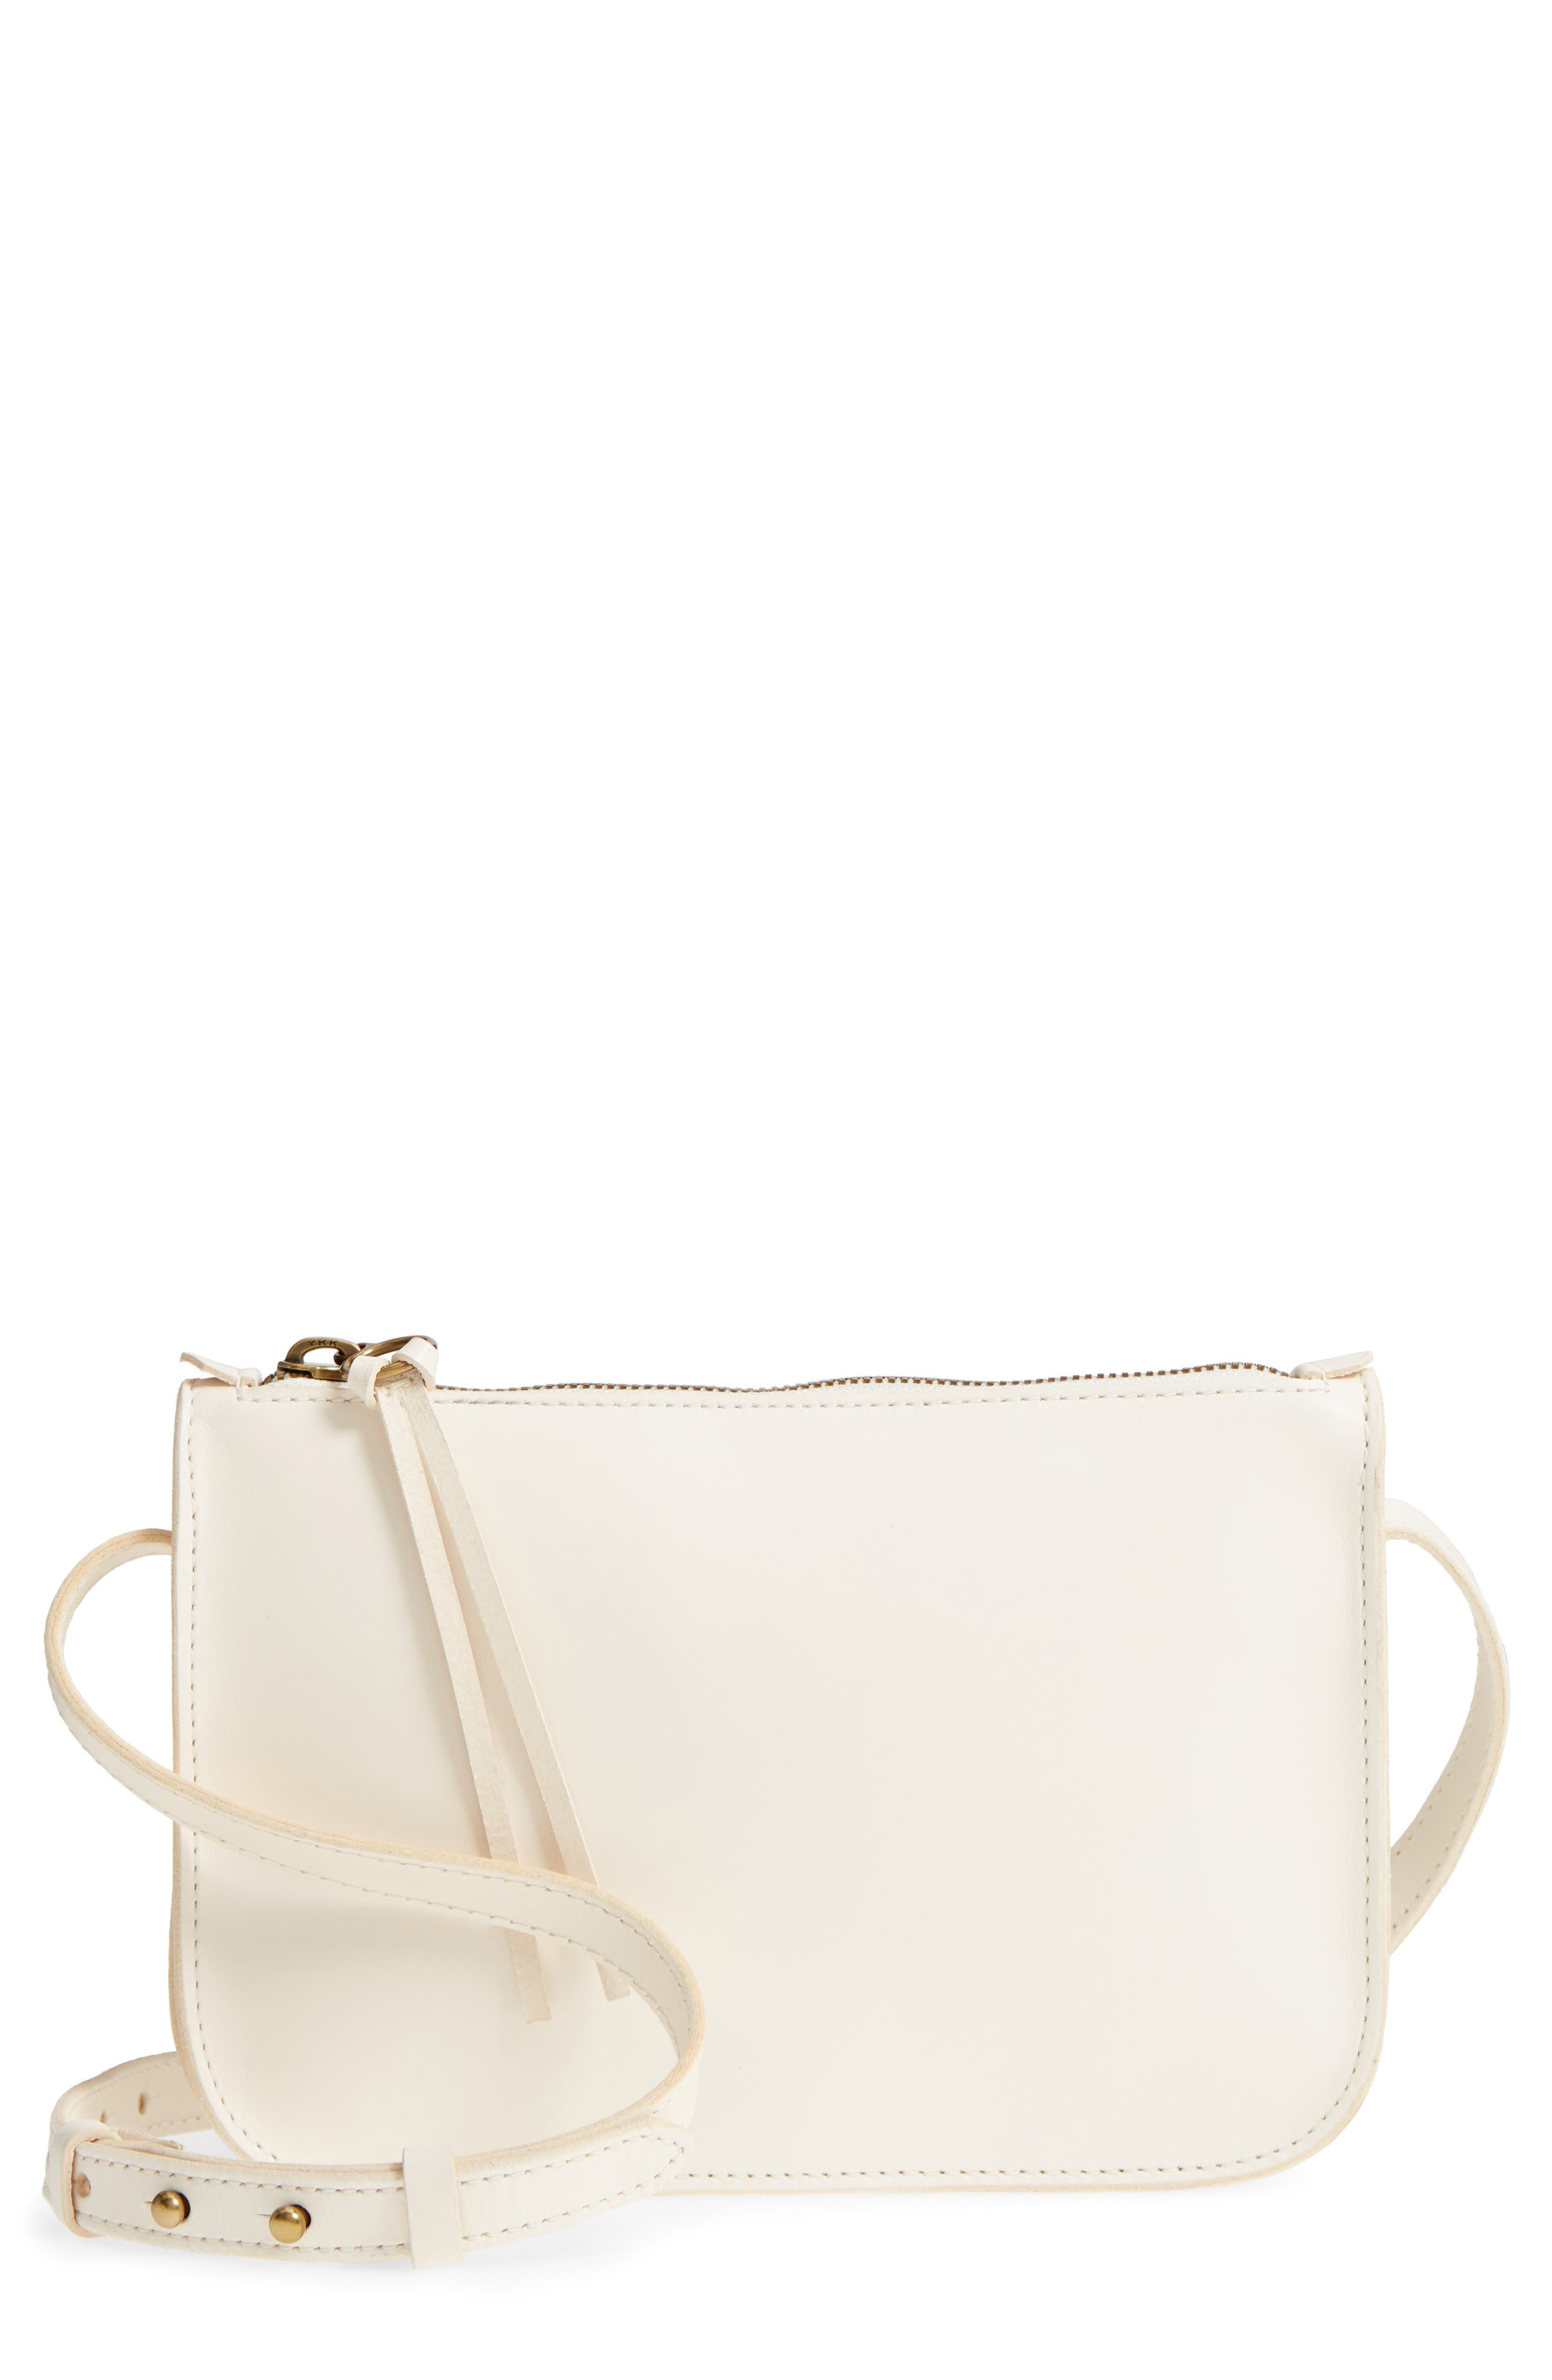 MADEWELL Simple Leather Crossbody Bag - Ivory